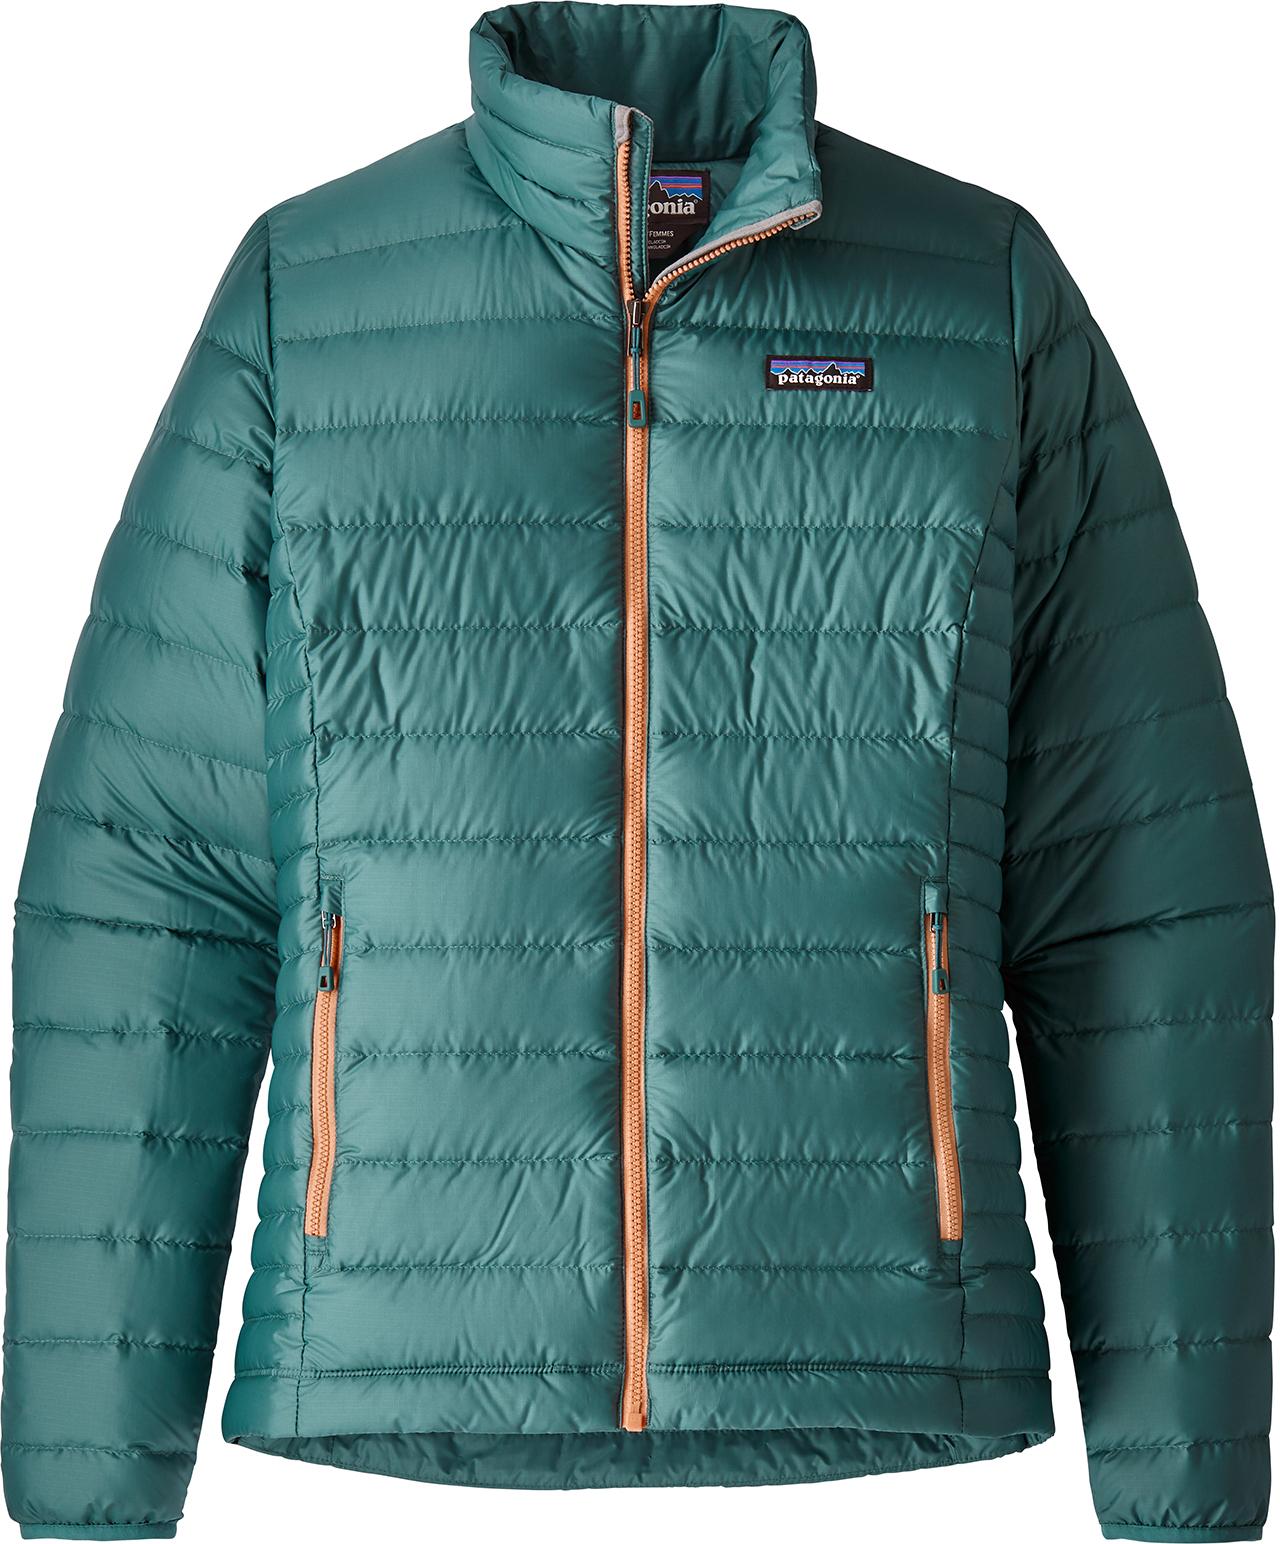 4ee8e0dda38 Patagonia Down Sweater - Women's | MEC